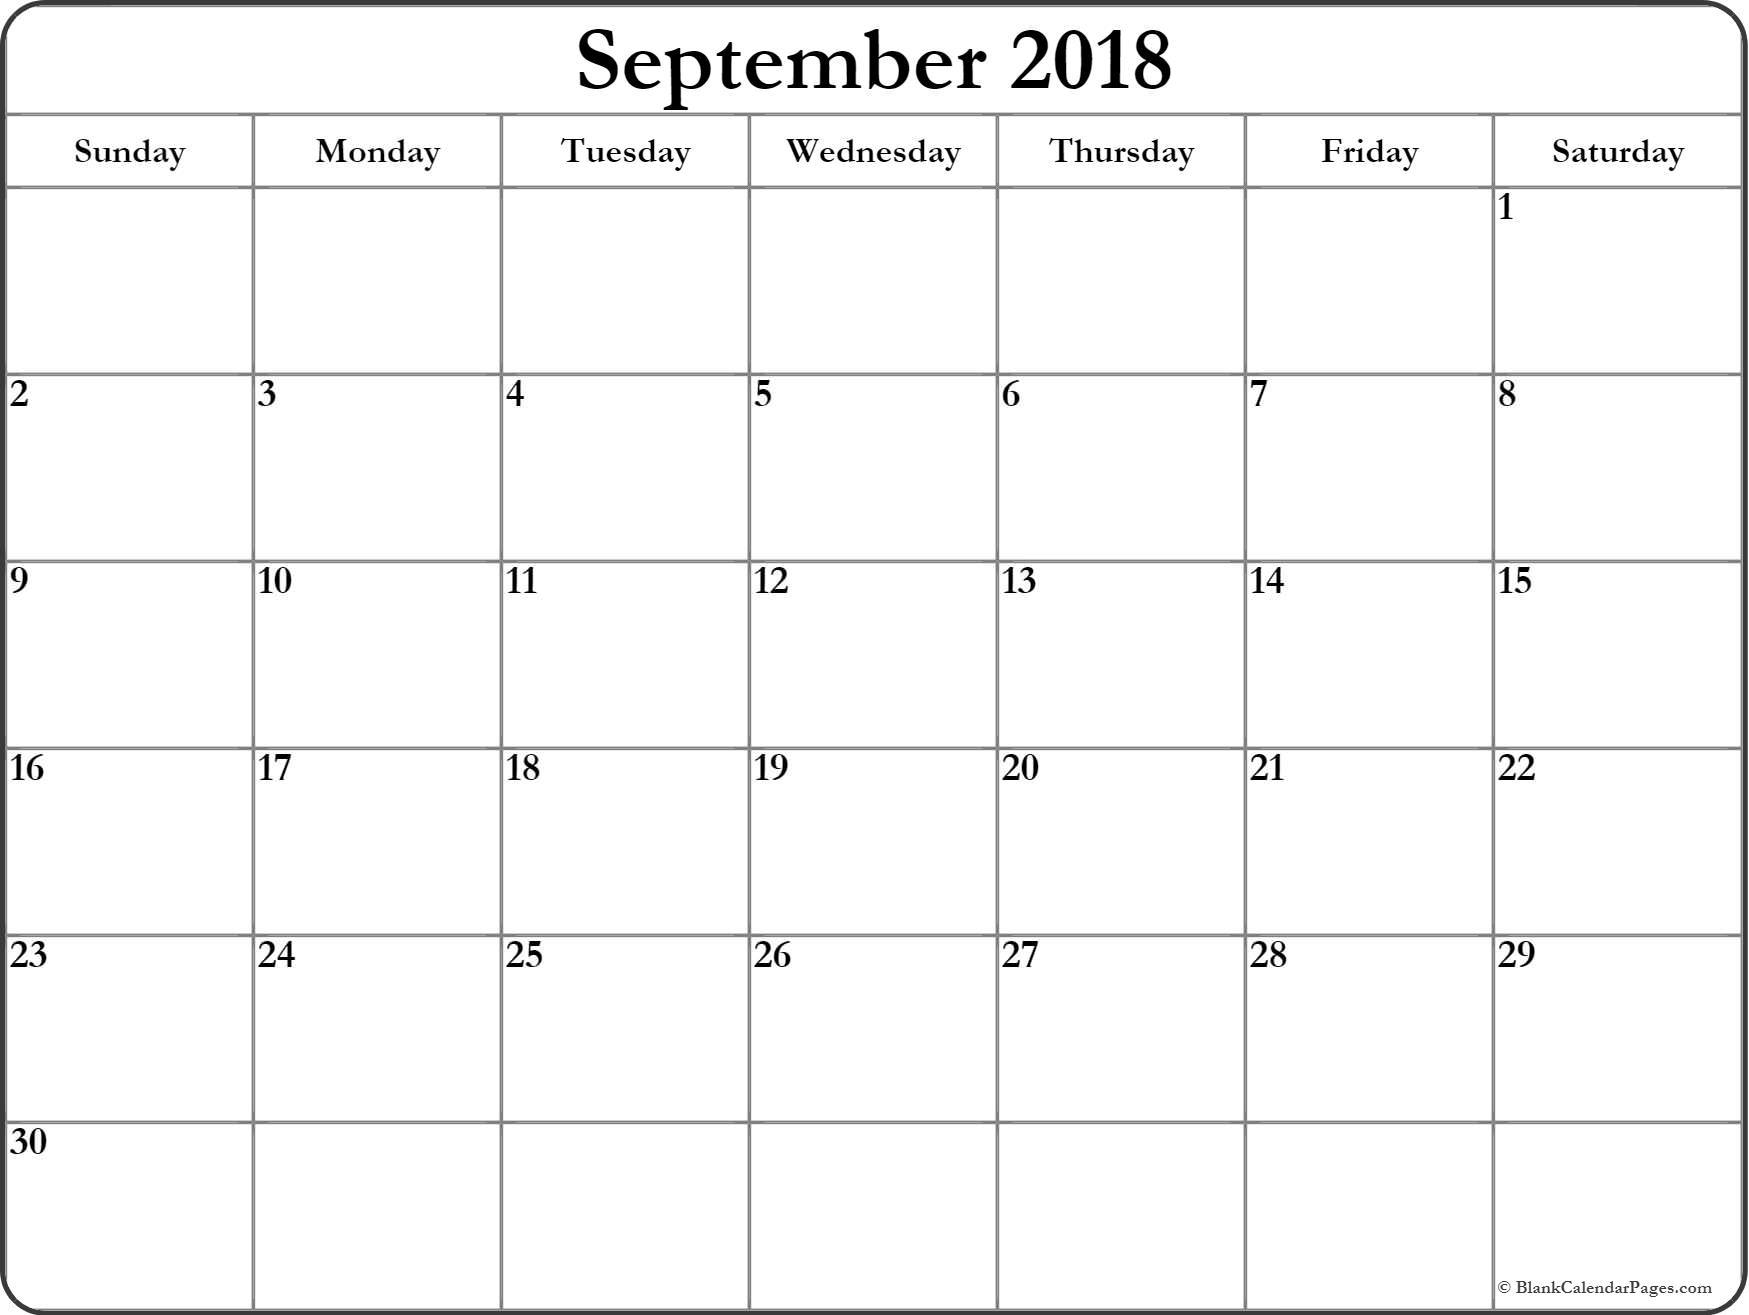 September 2018 Calendar | Free Printable Monthly Calendars throughout Blank Printable September Calendar